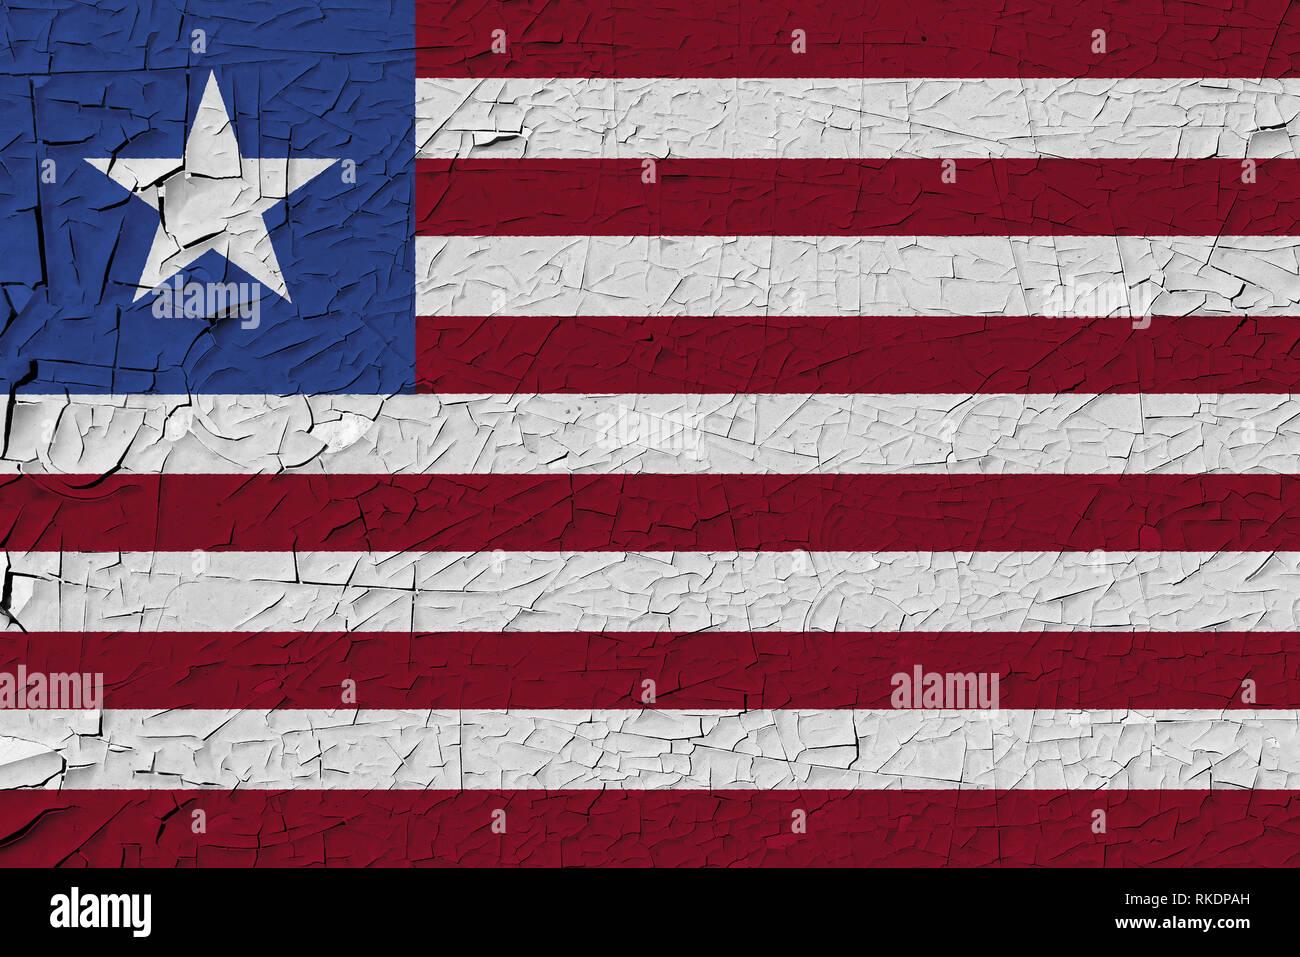 Liberia painted flag. Patriotic old grunge background. National flag of Liberia - Stock Image